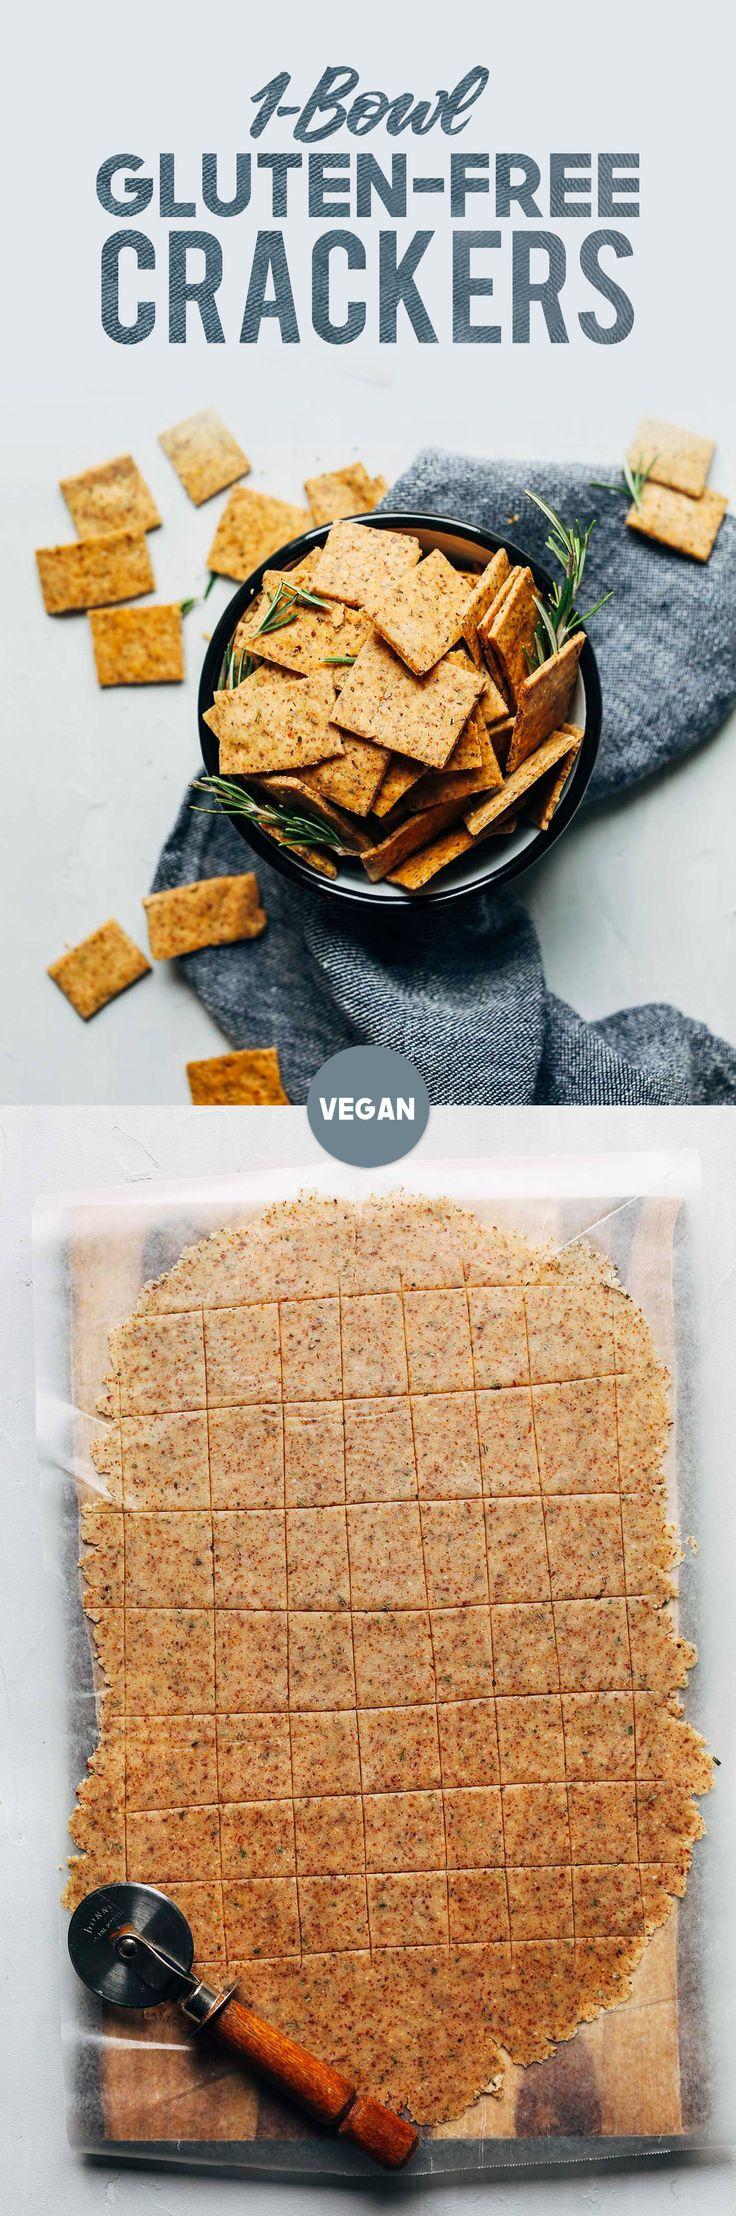 EASY Vegan Gluten-Free Crackers! 7 Ingredients, 1 Bowl, SUPER crispy and delicious!